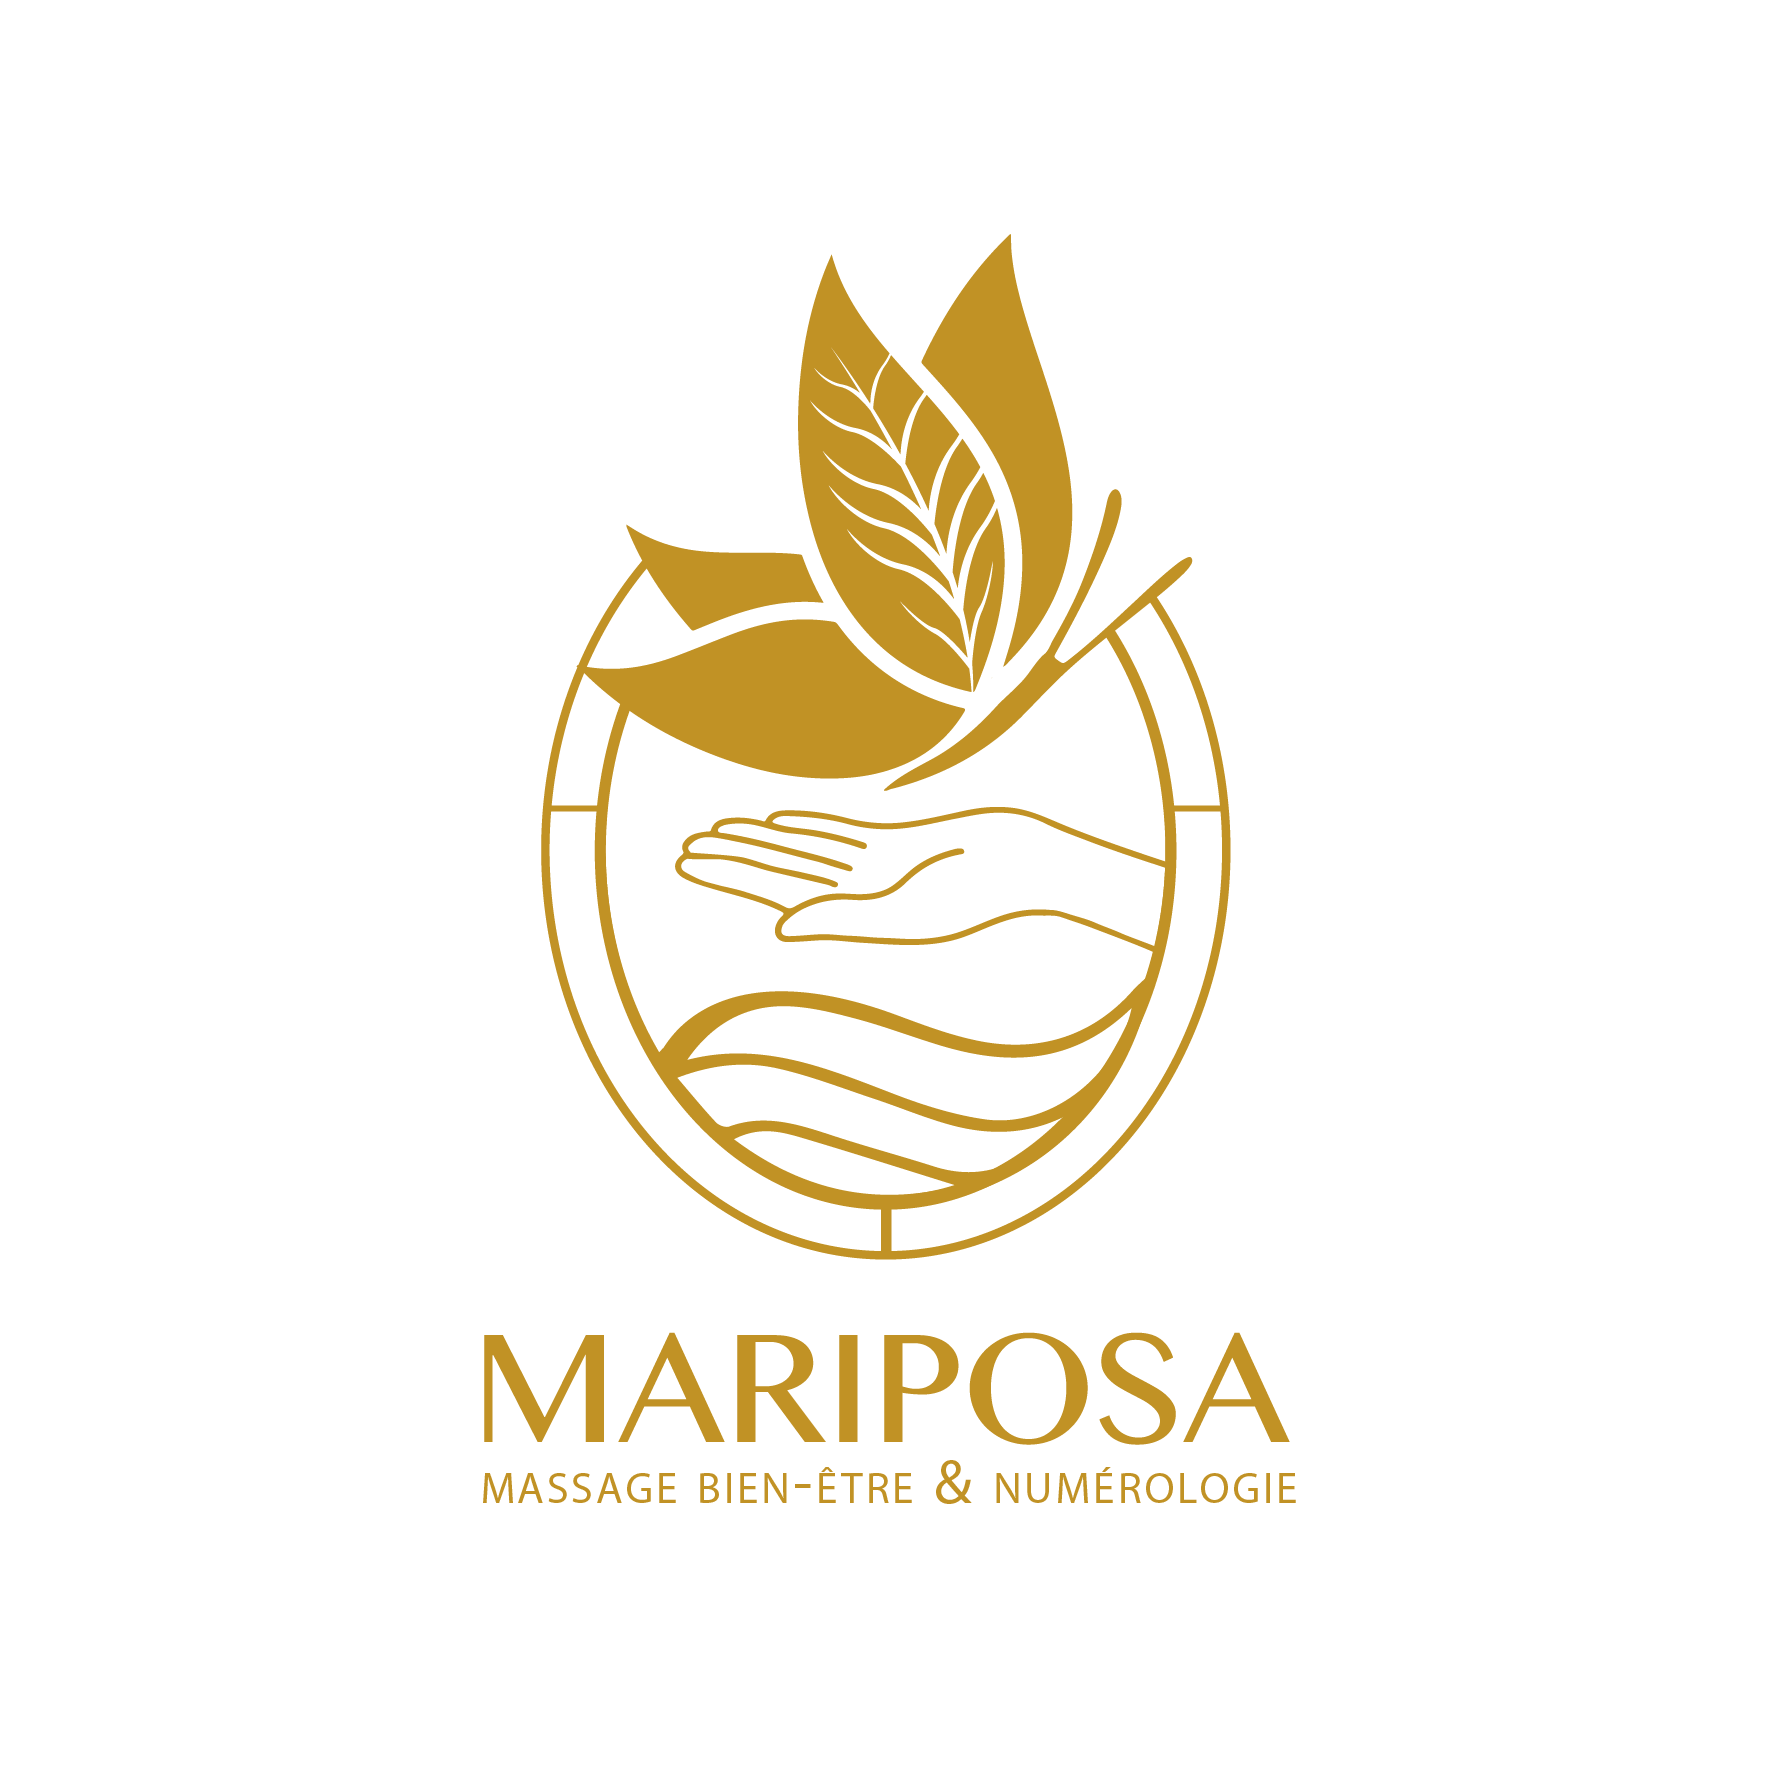 LOGO-MARIPOSA-BIEN-ETRE-massage-capbreton-mariposabienetre-large-jaune